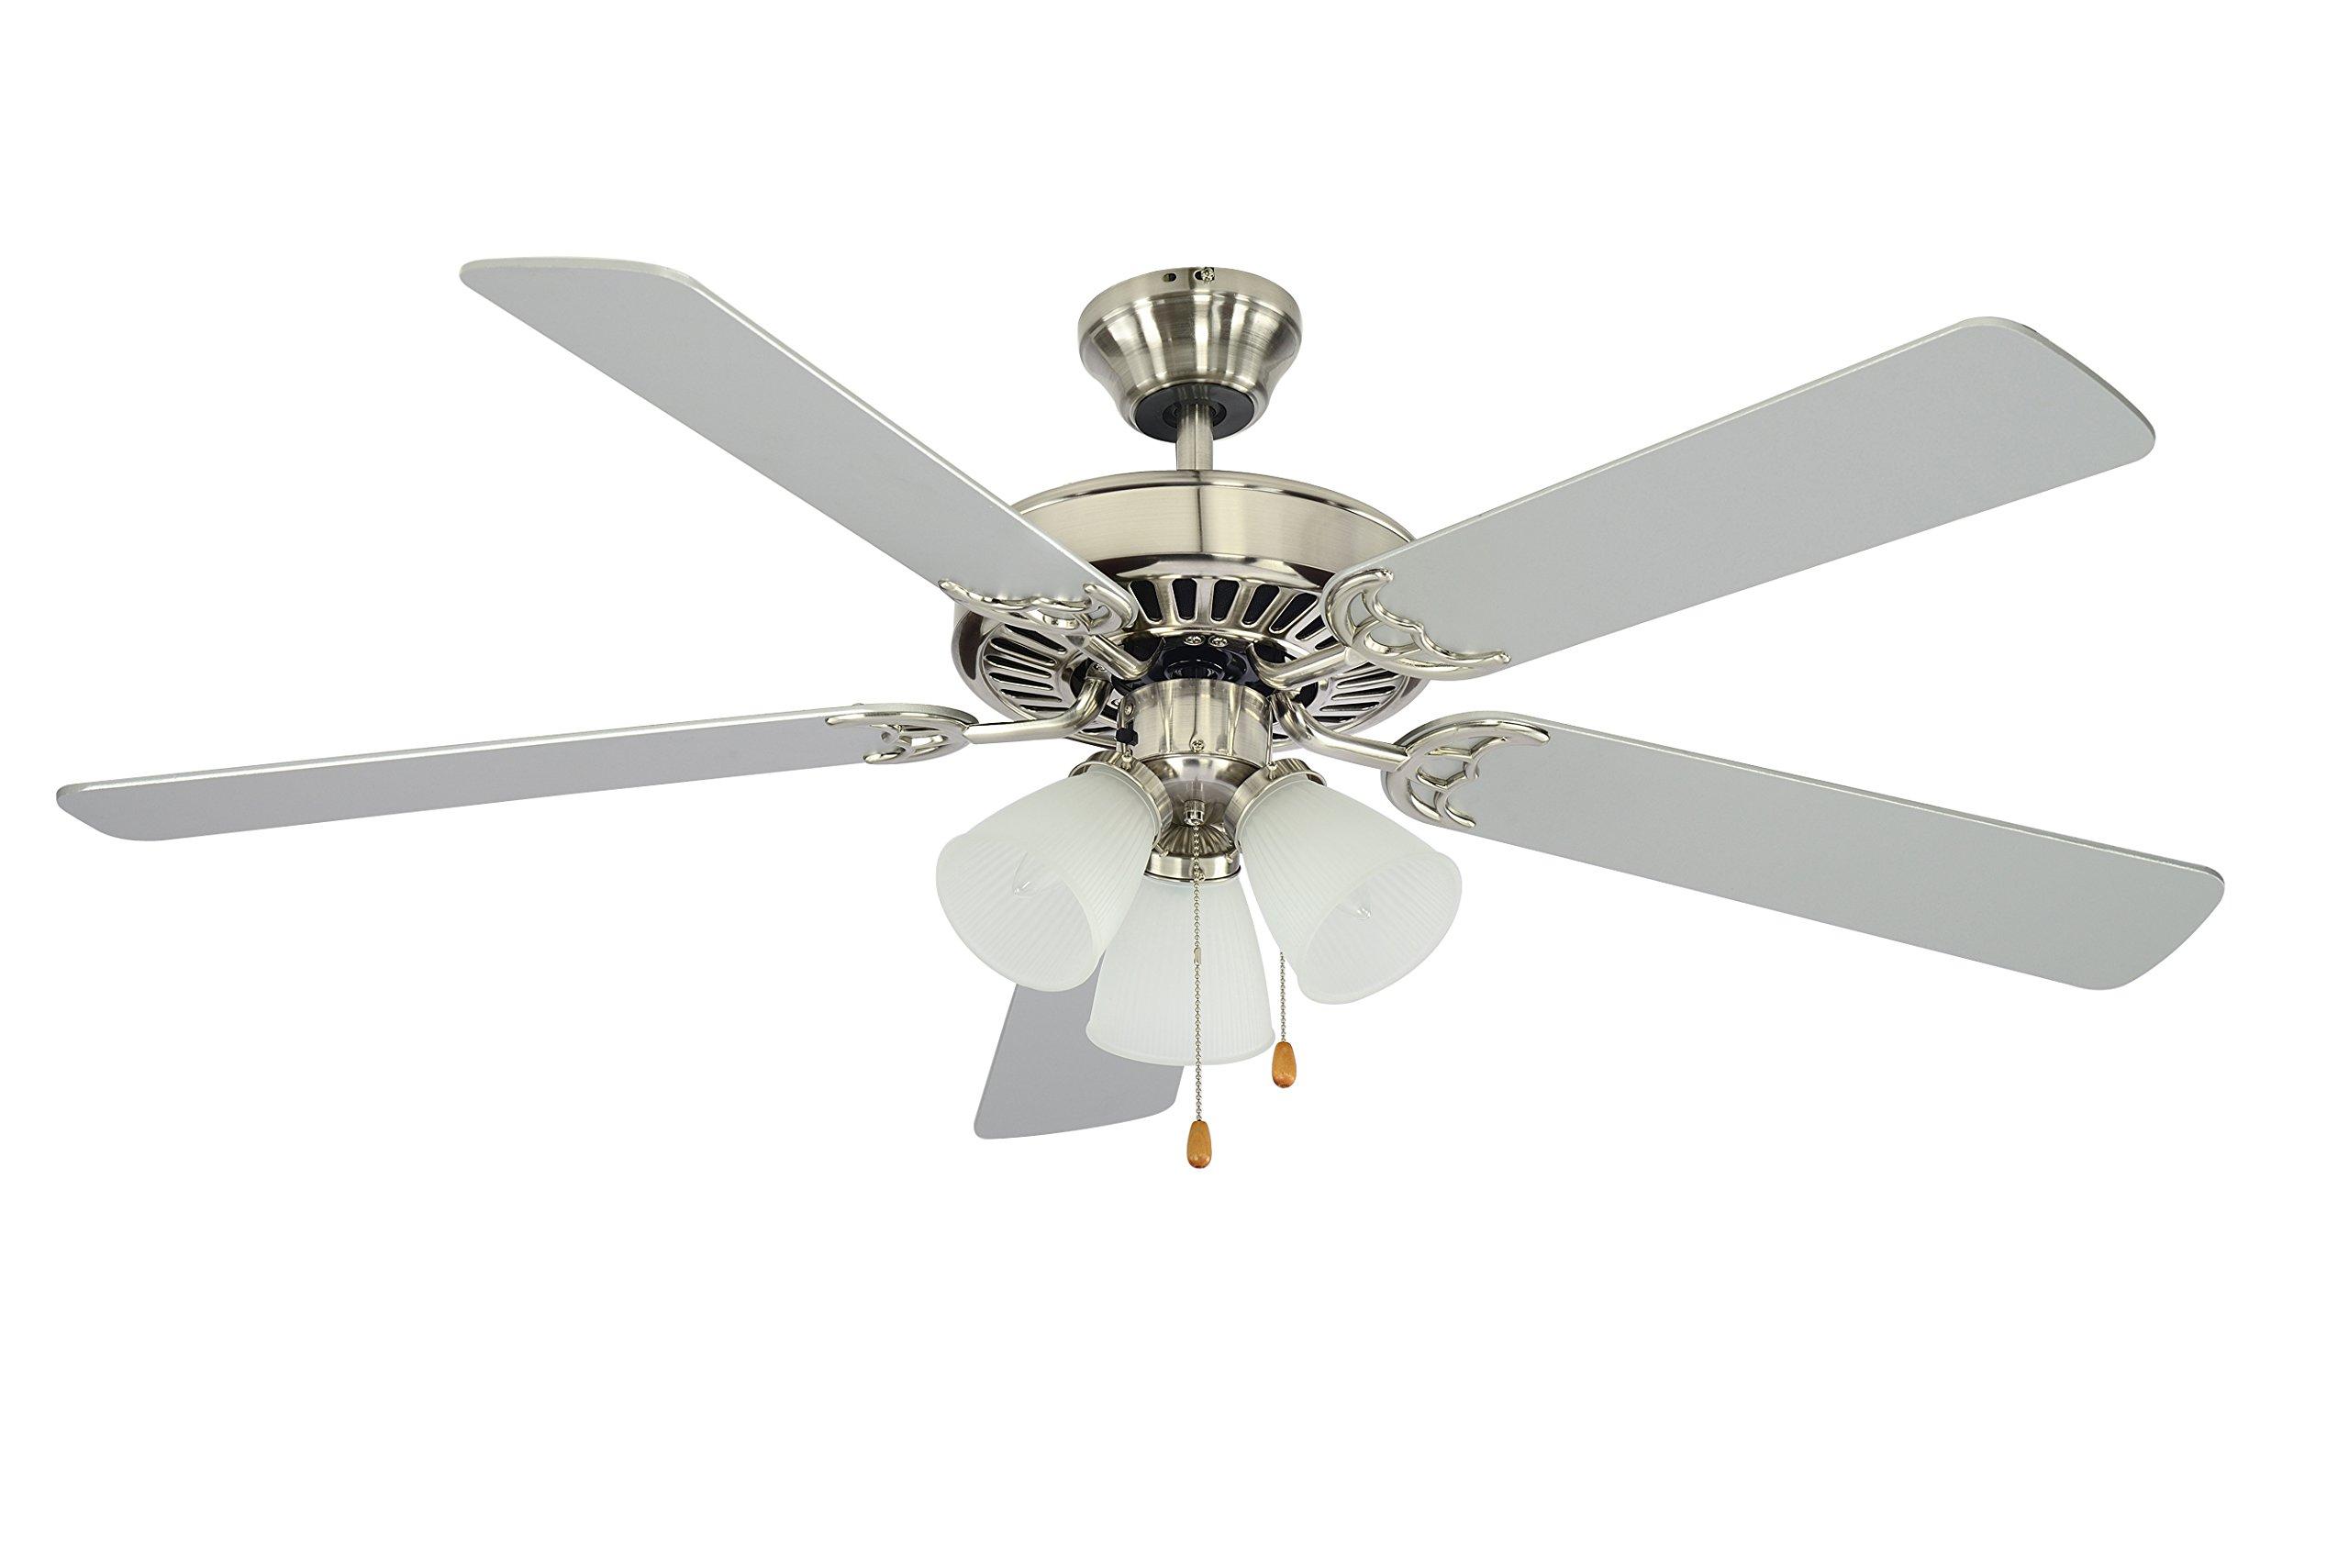 Trans Globe Lighting F-1005 BN Indoor  Spottswood Ceiling Fan, Brushed Nickel